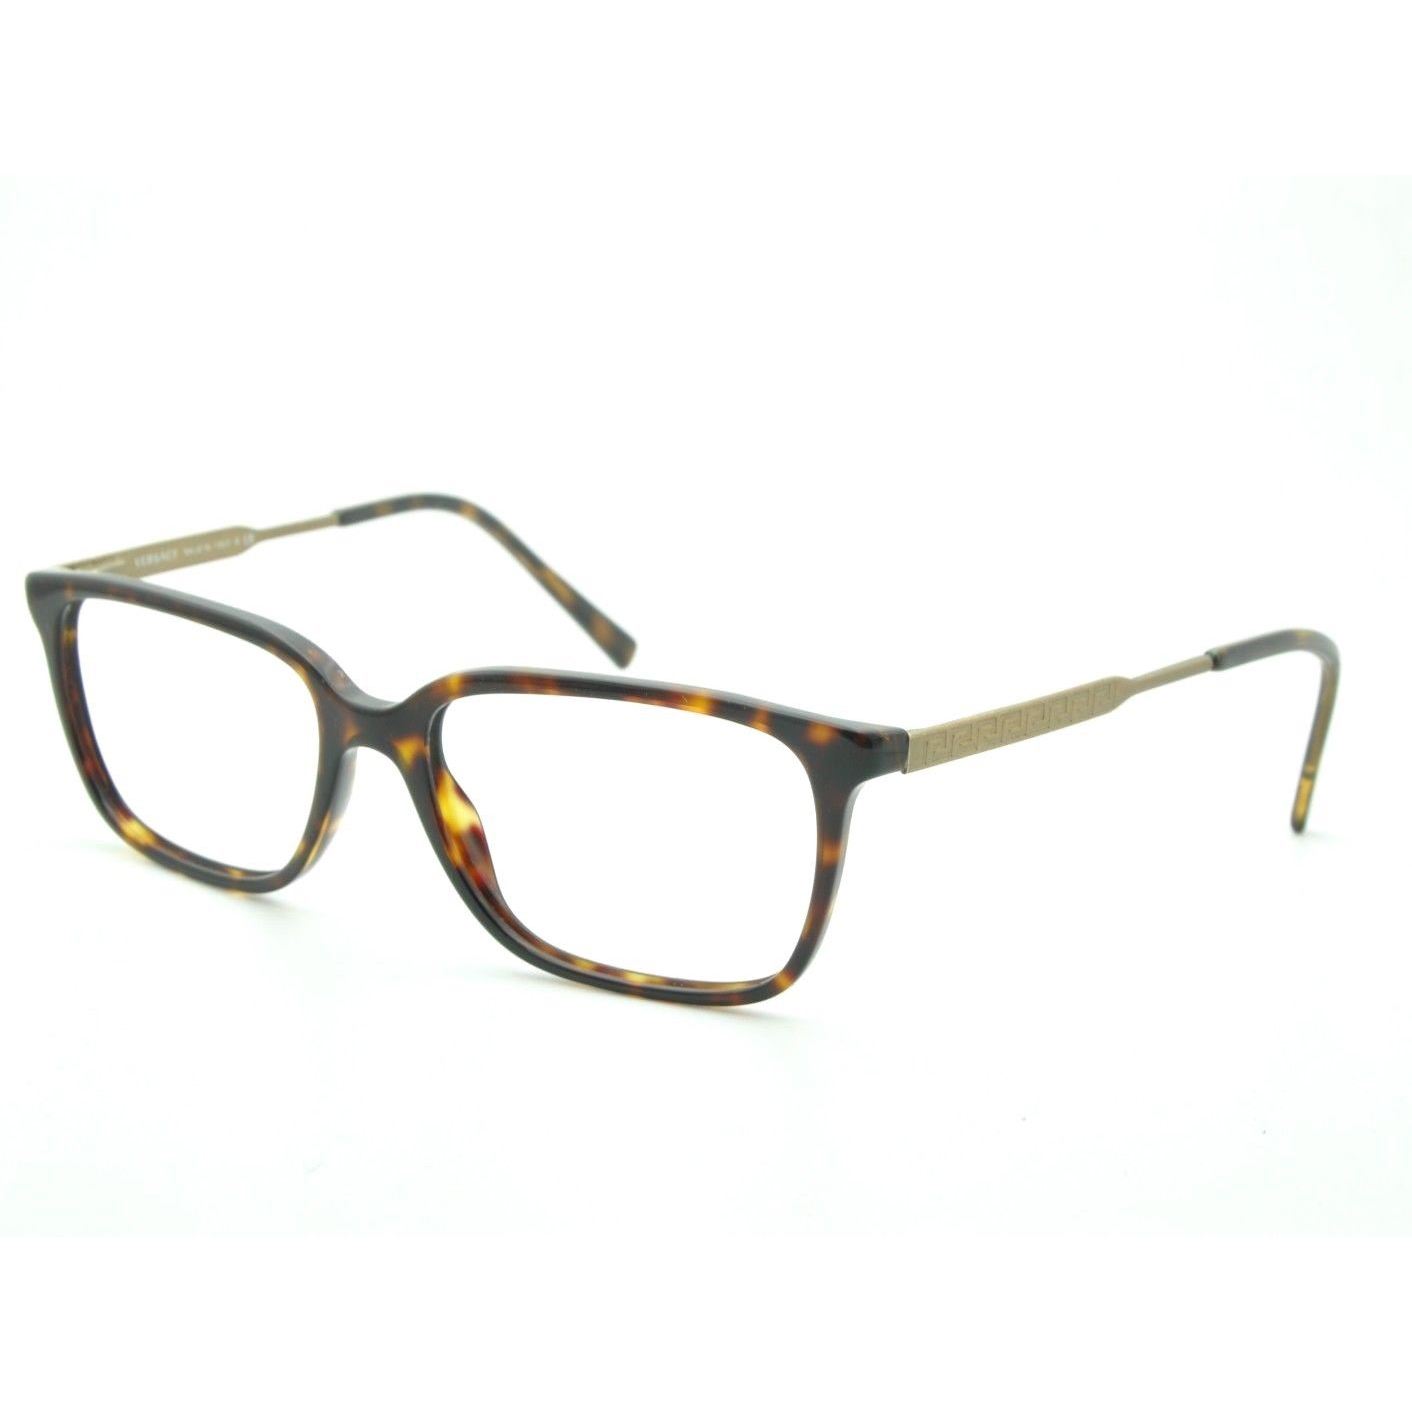 78ac8bd999d6a Versace MOD 3209 108 Tortoise   Gold Eyeglasses